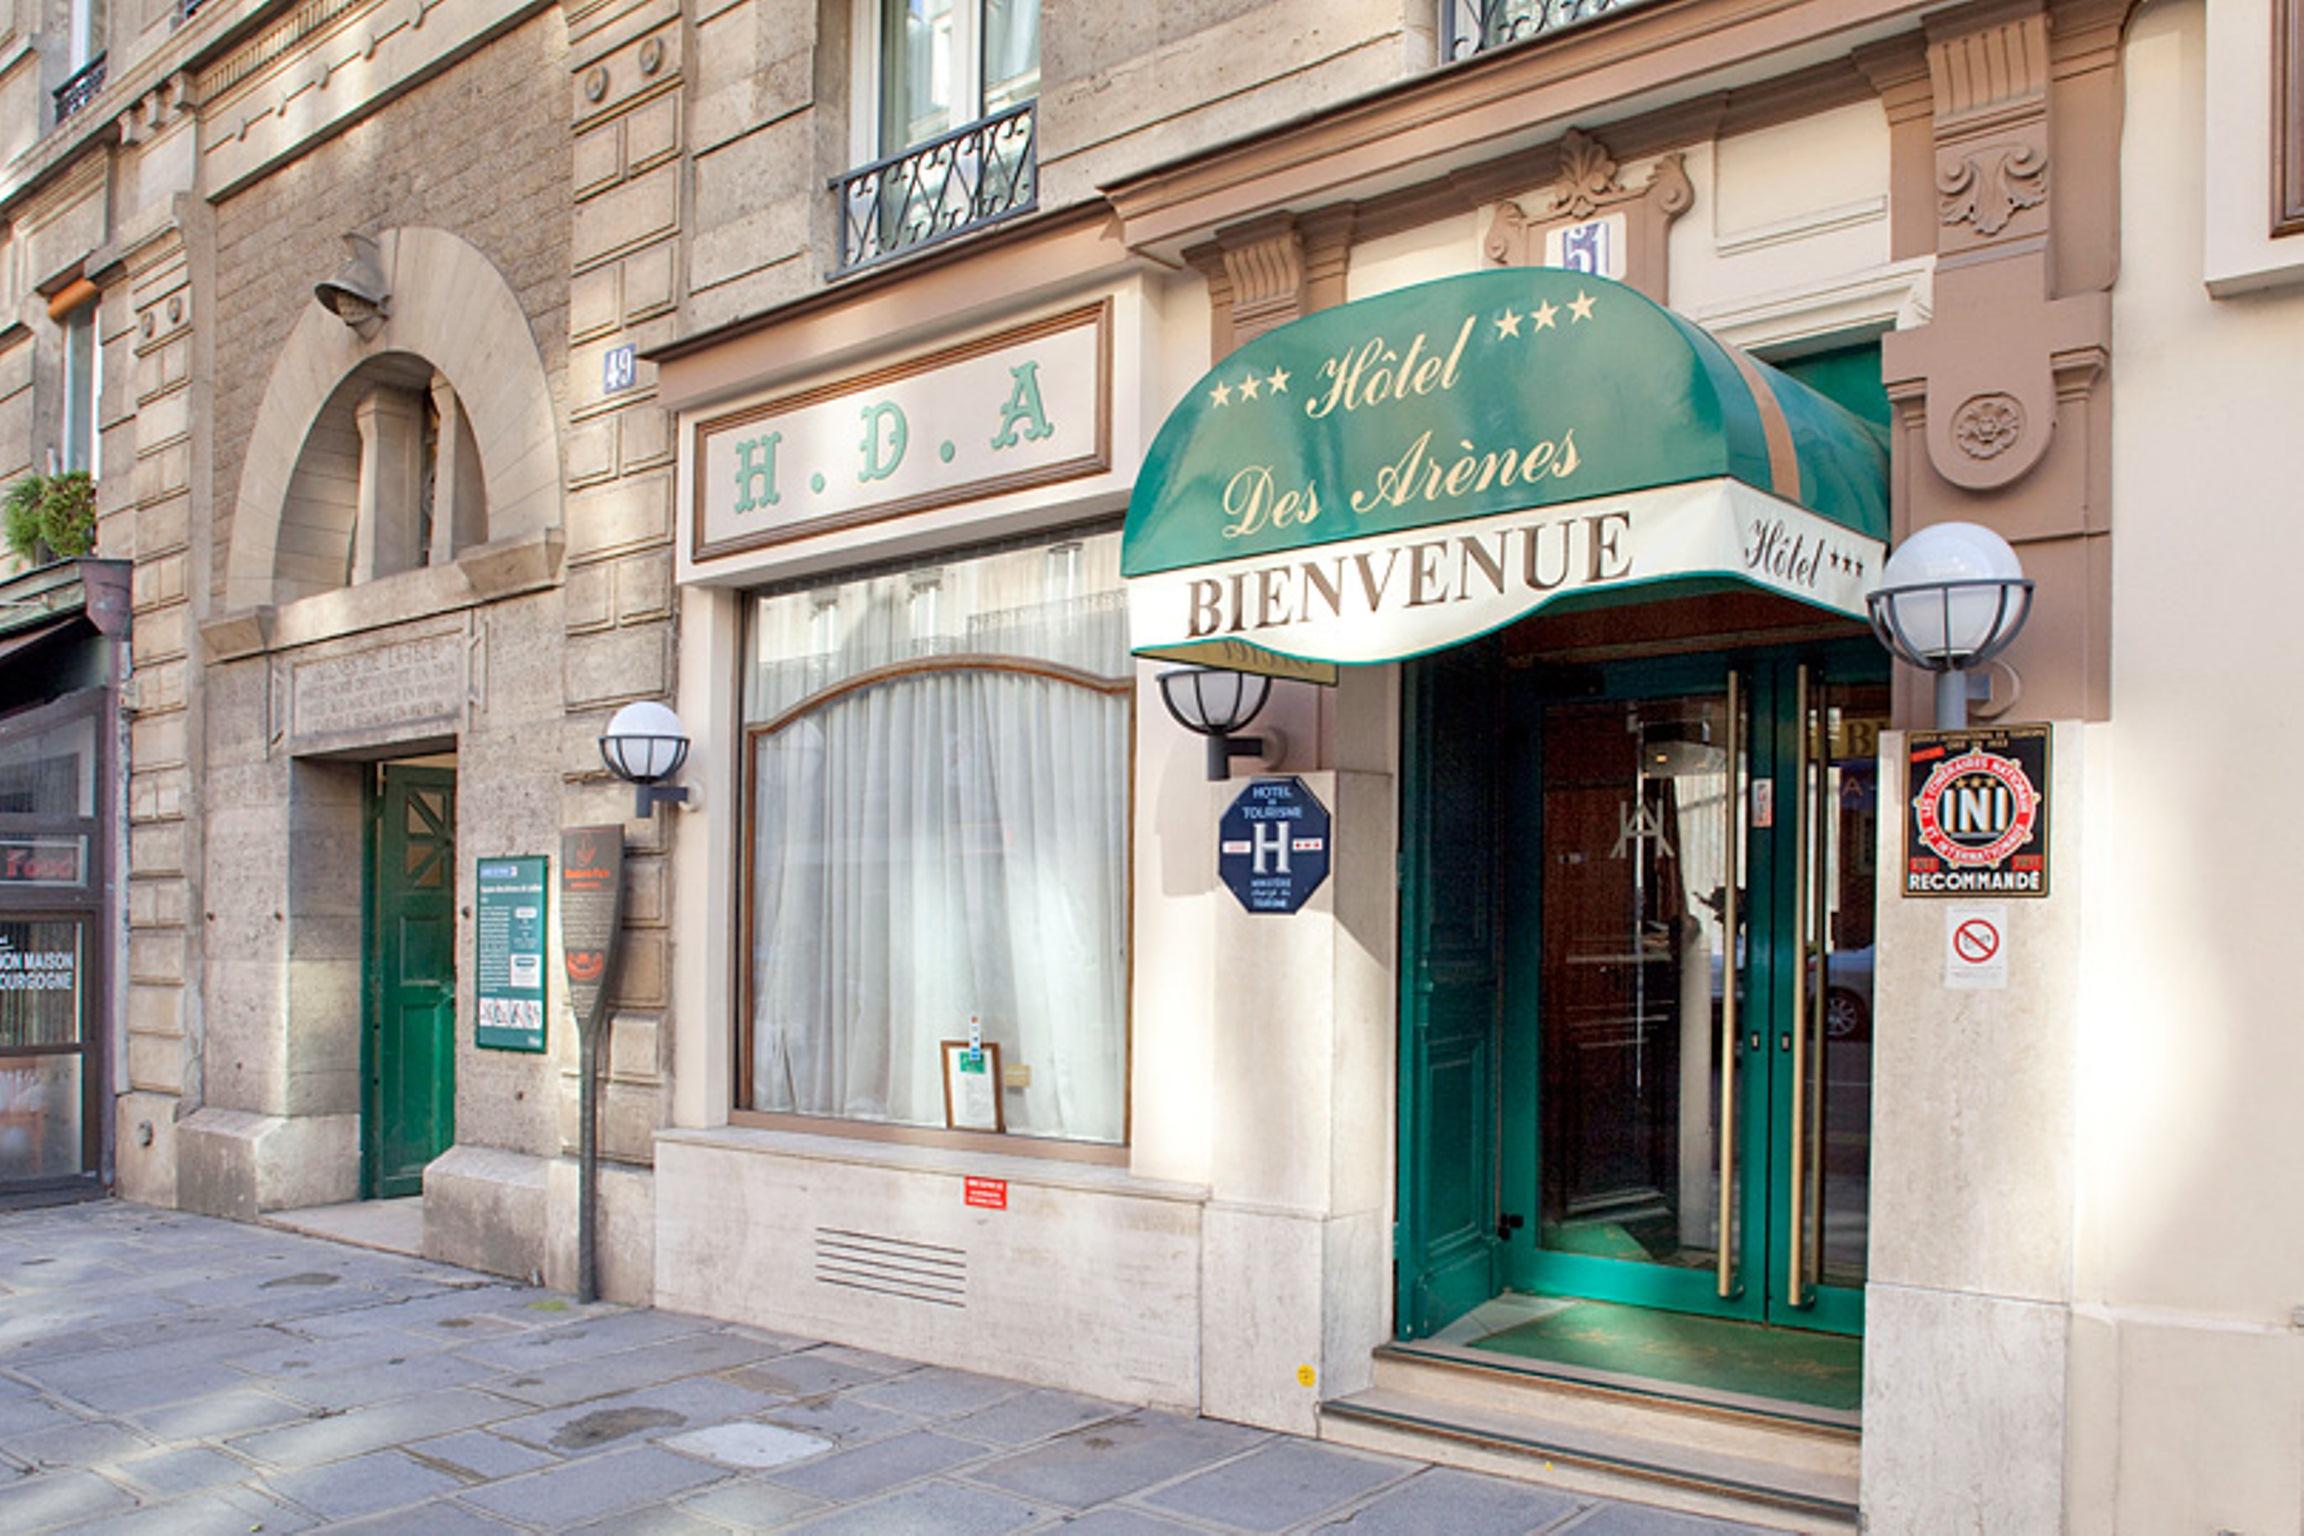 Libertel Austerlitz Jardin Des Plantes Génial Hotel Des arenes Pariz Francuska Najniže Hotelske Cijene S Of 66 Élégant Libertel Austerlitz Jardin Des Plantes